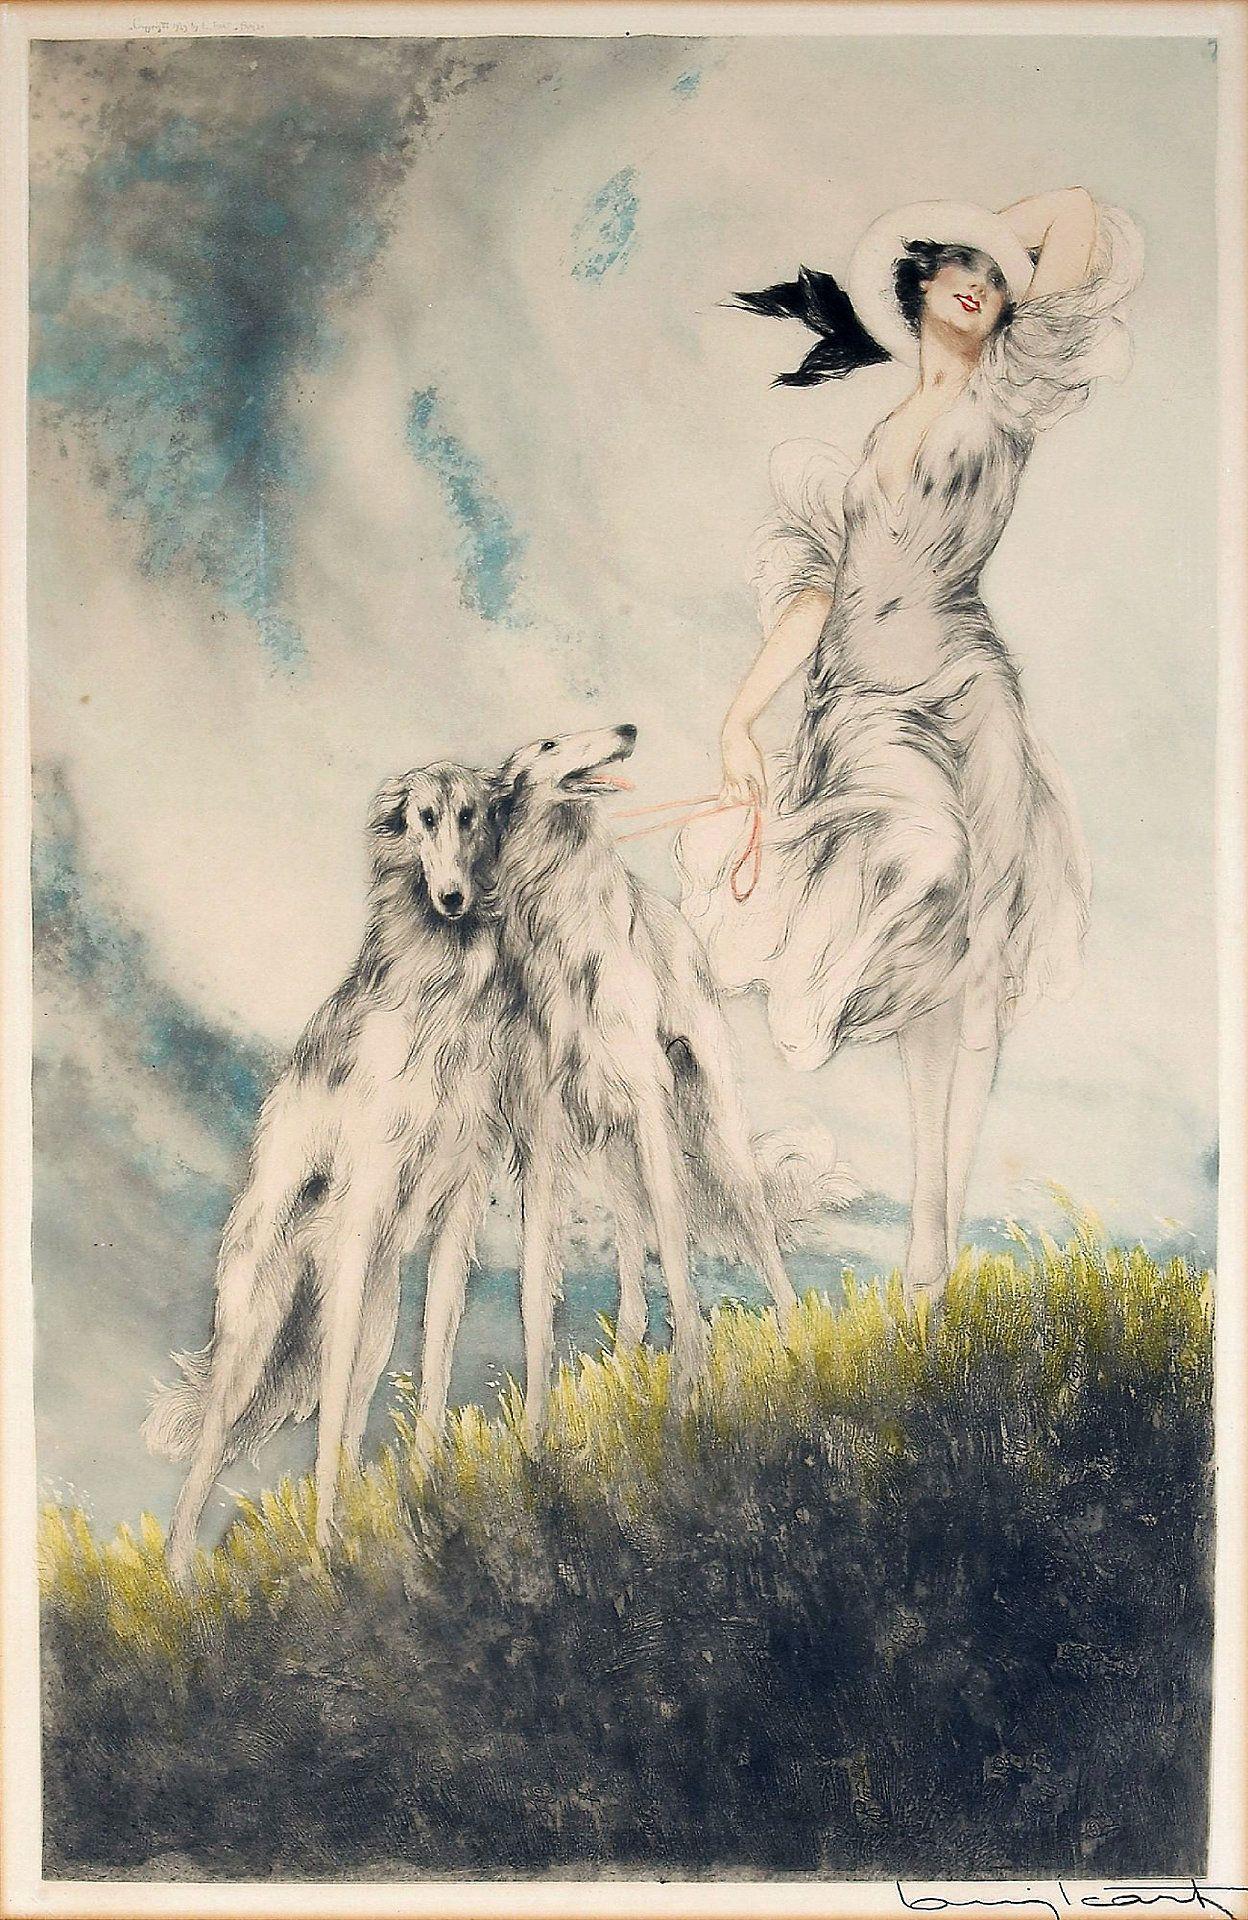 I love Borzoi dogs in art.   Louis Icart 'Joy Of Life' 1929